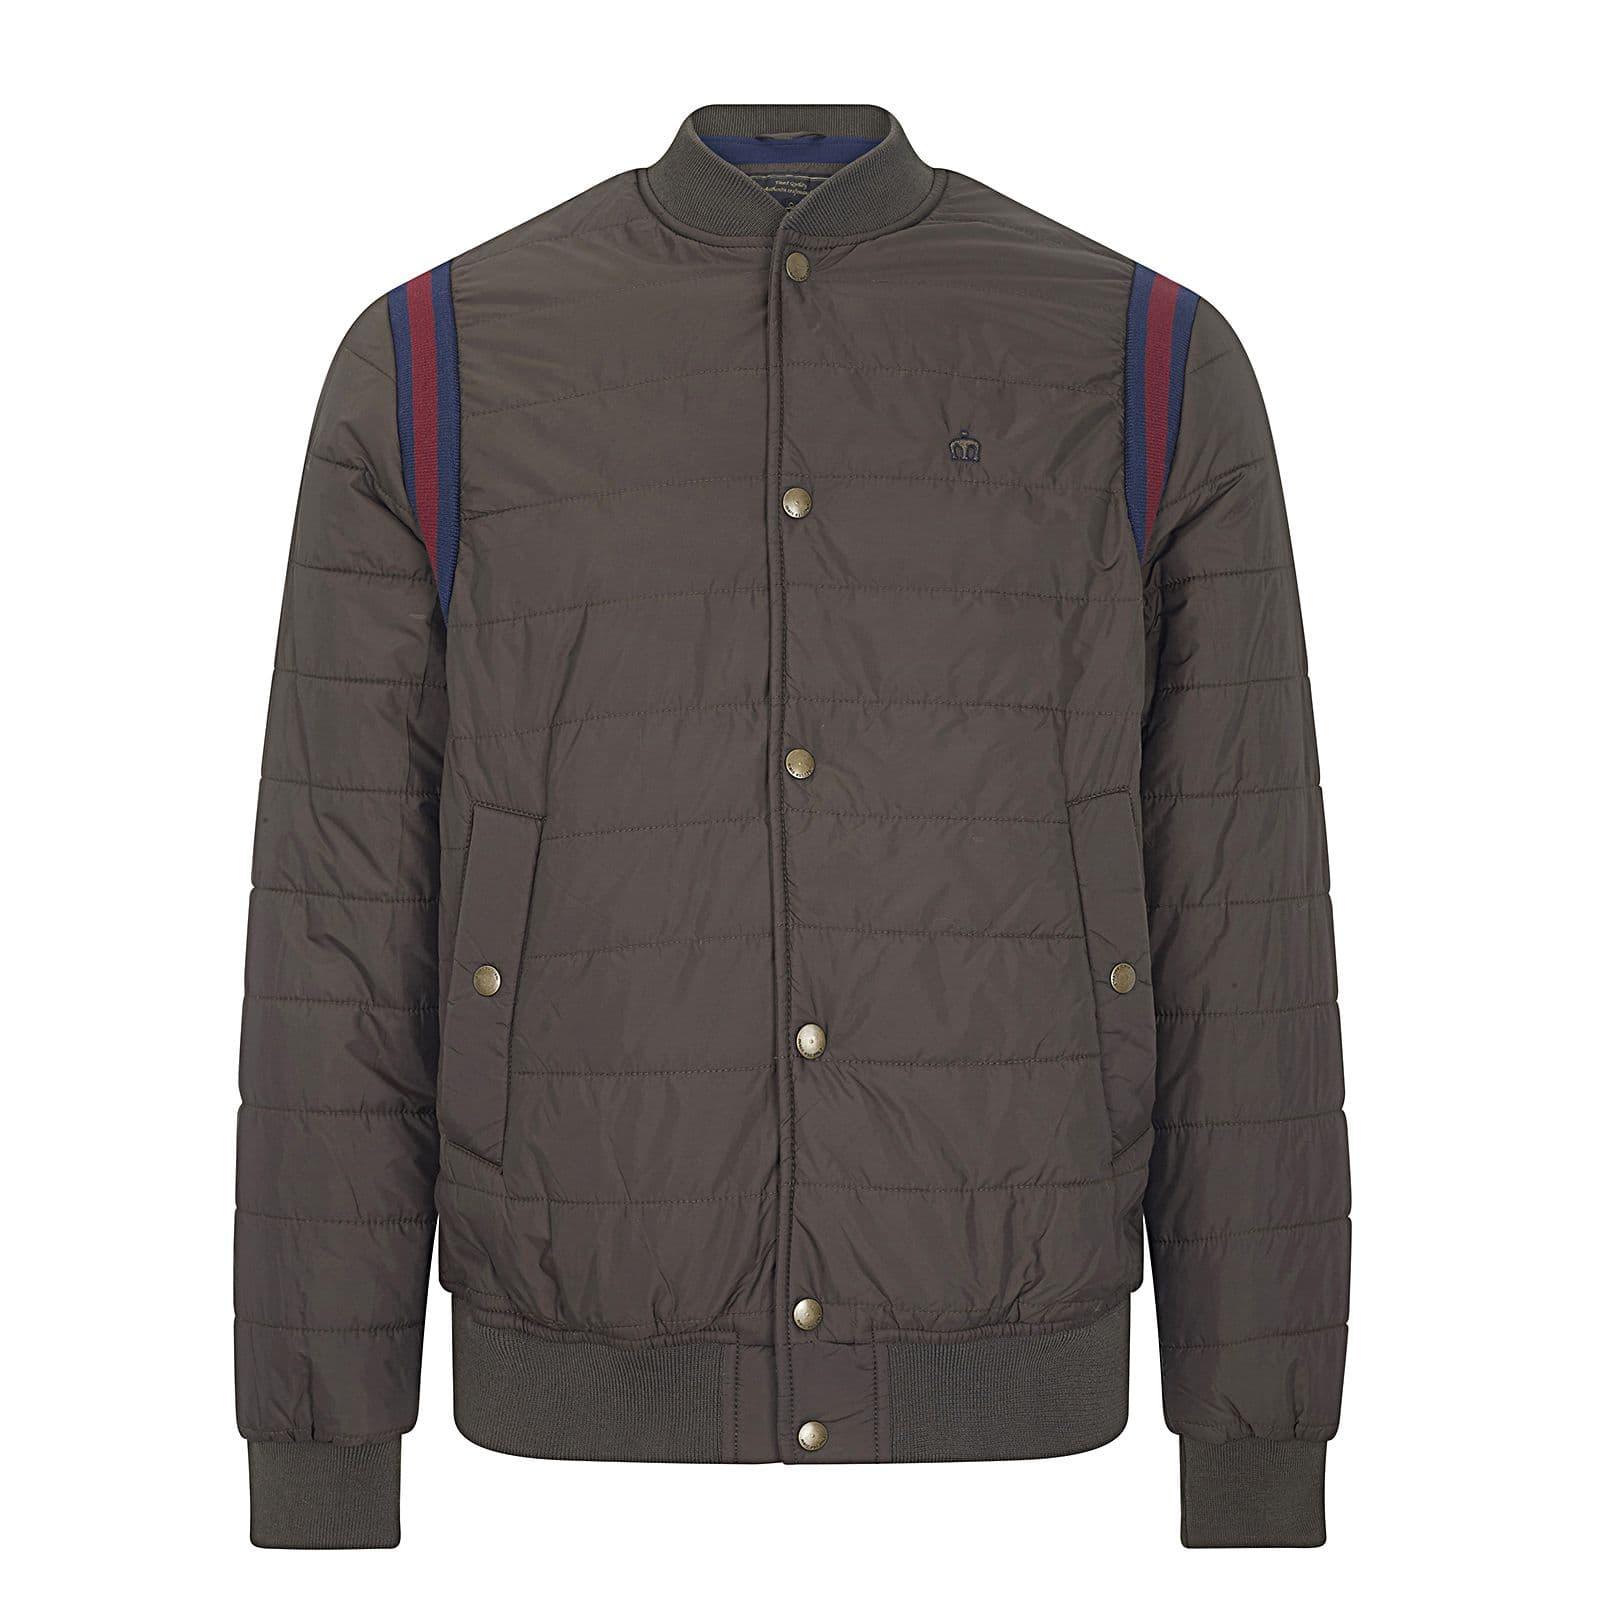 Бомбер HydeКуртки под заказ<br><br><br>Артикул: 1117202<br>Материал: 100% нейлон<br>Цвет: серый хаки<br>Пол: Мужской